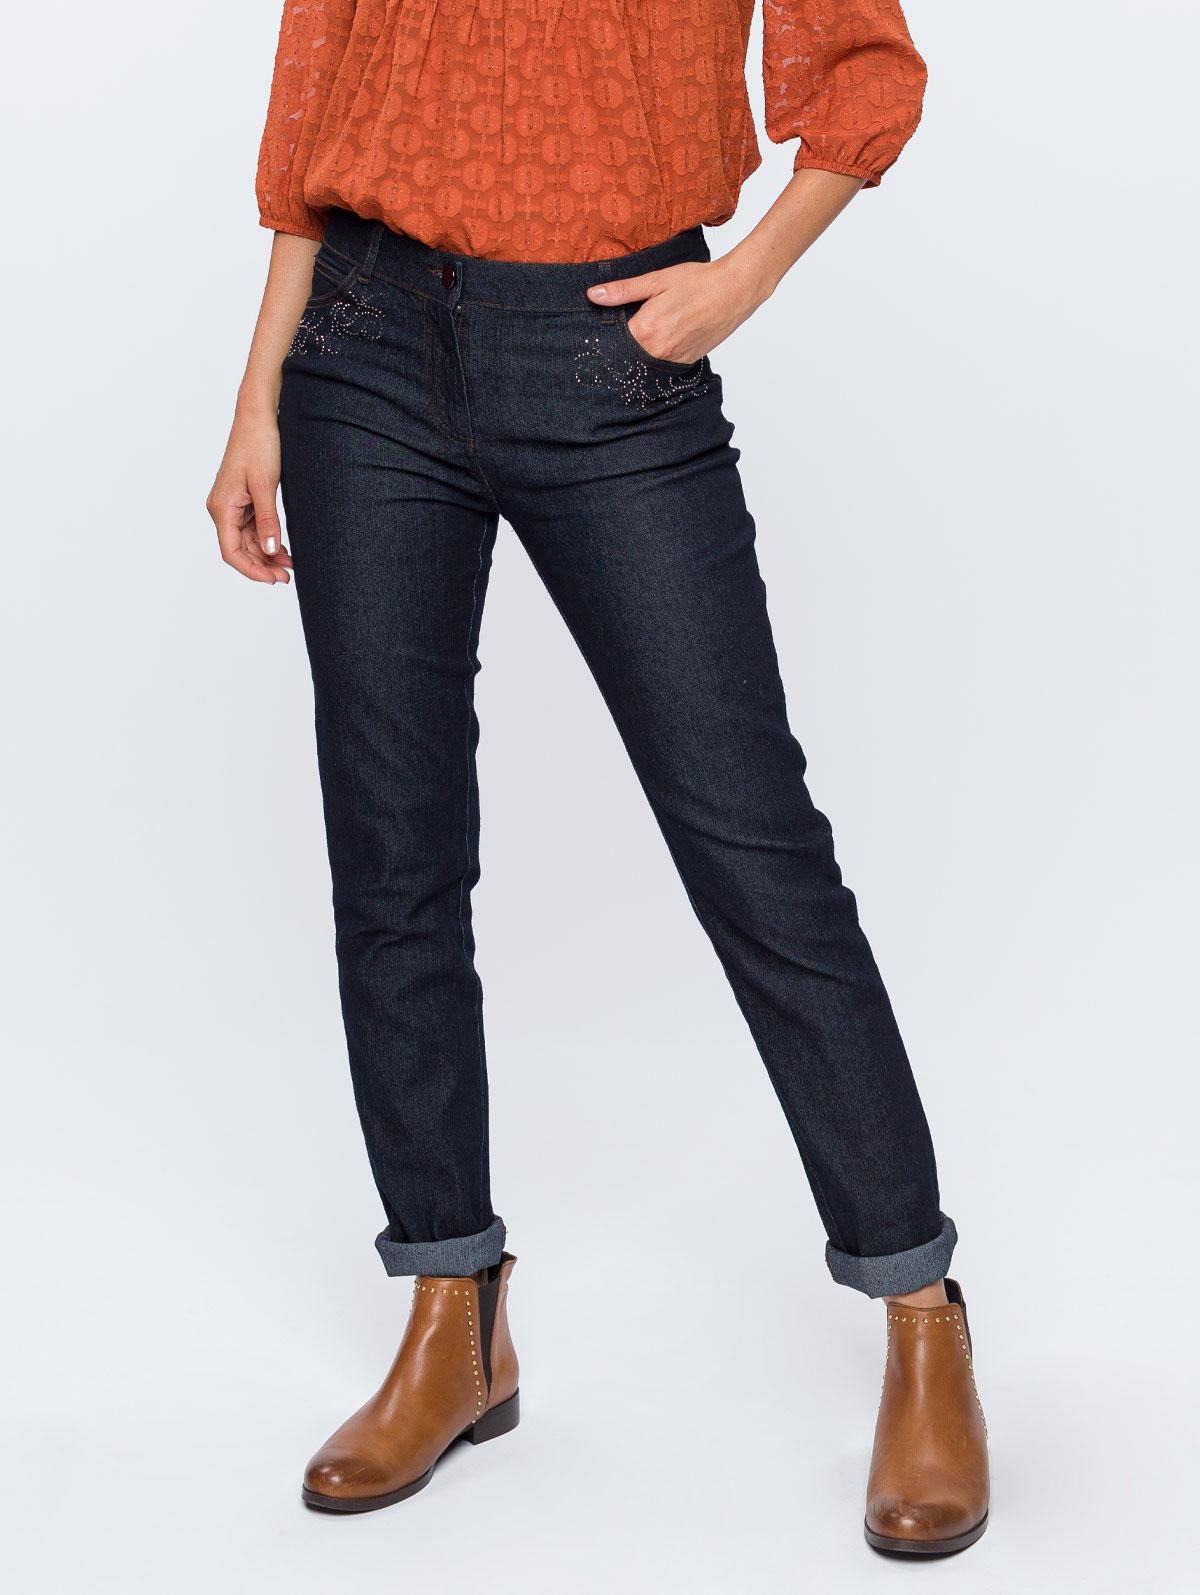 Jean poches arabesques strass stone - maboutiqueplus